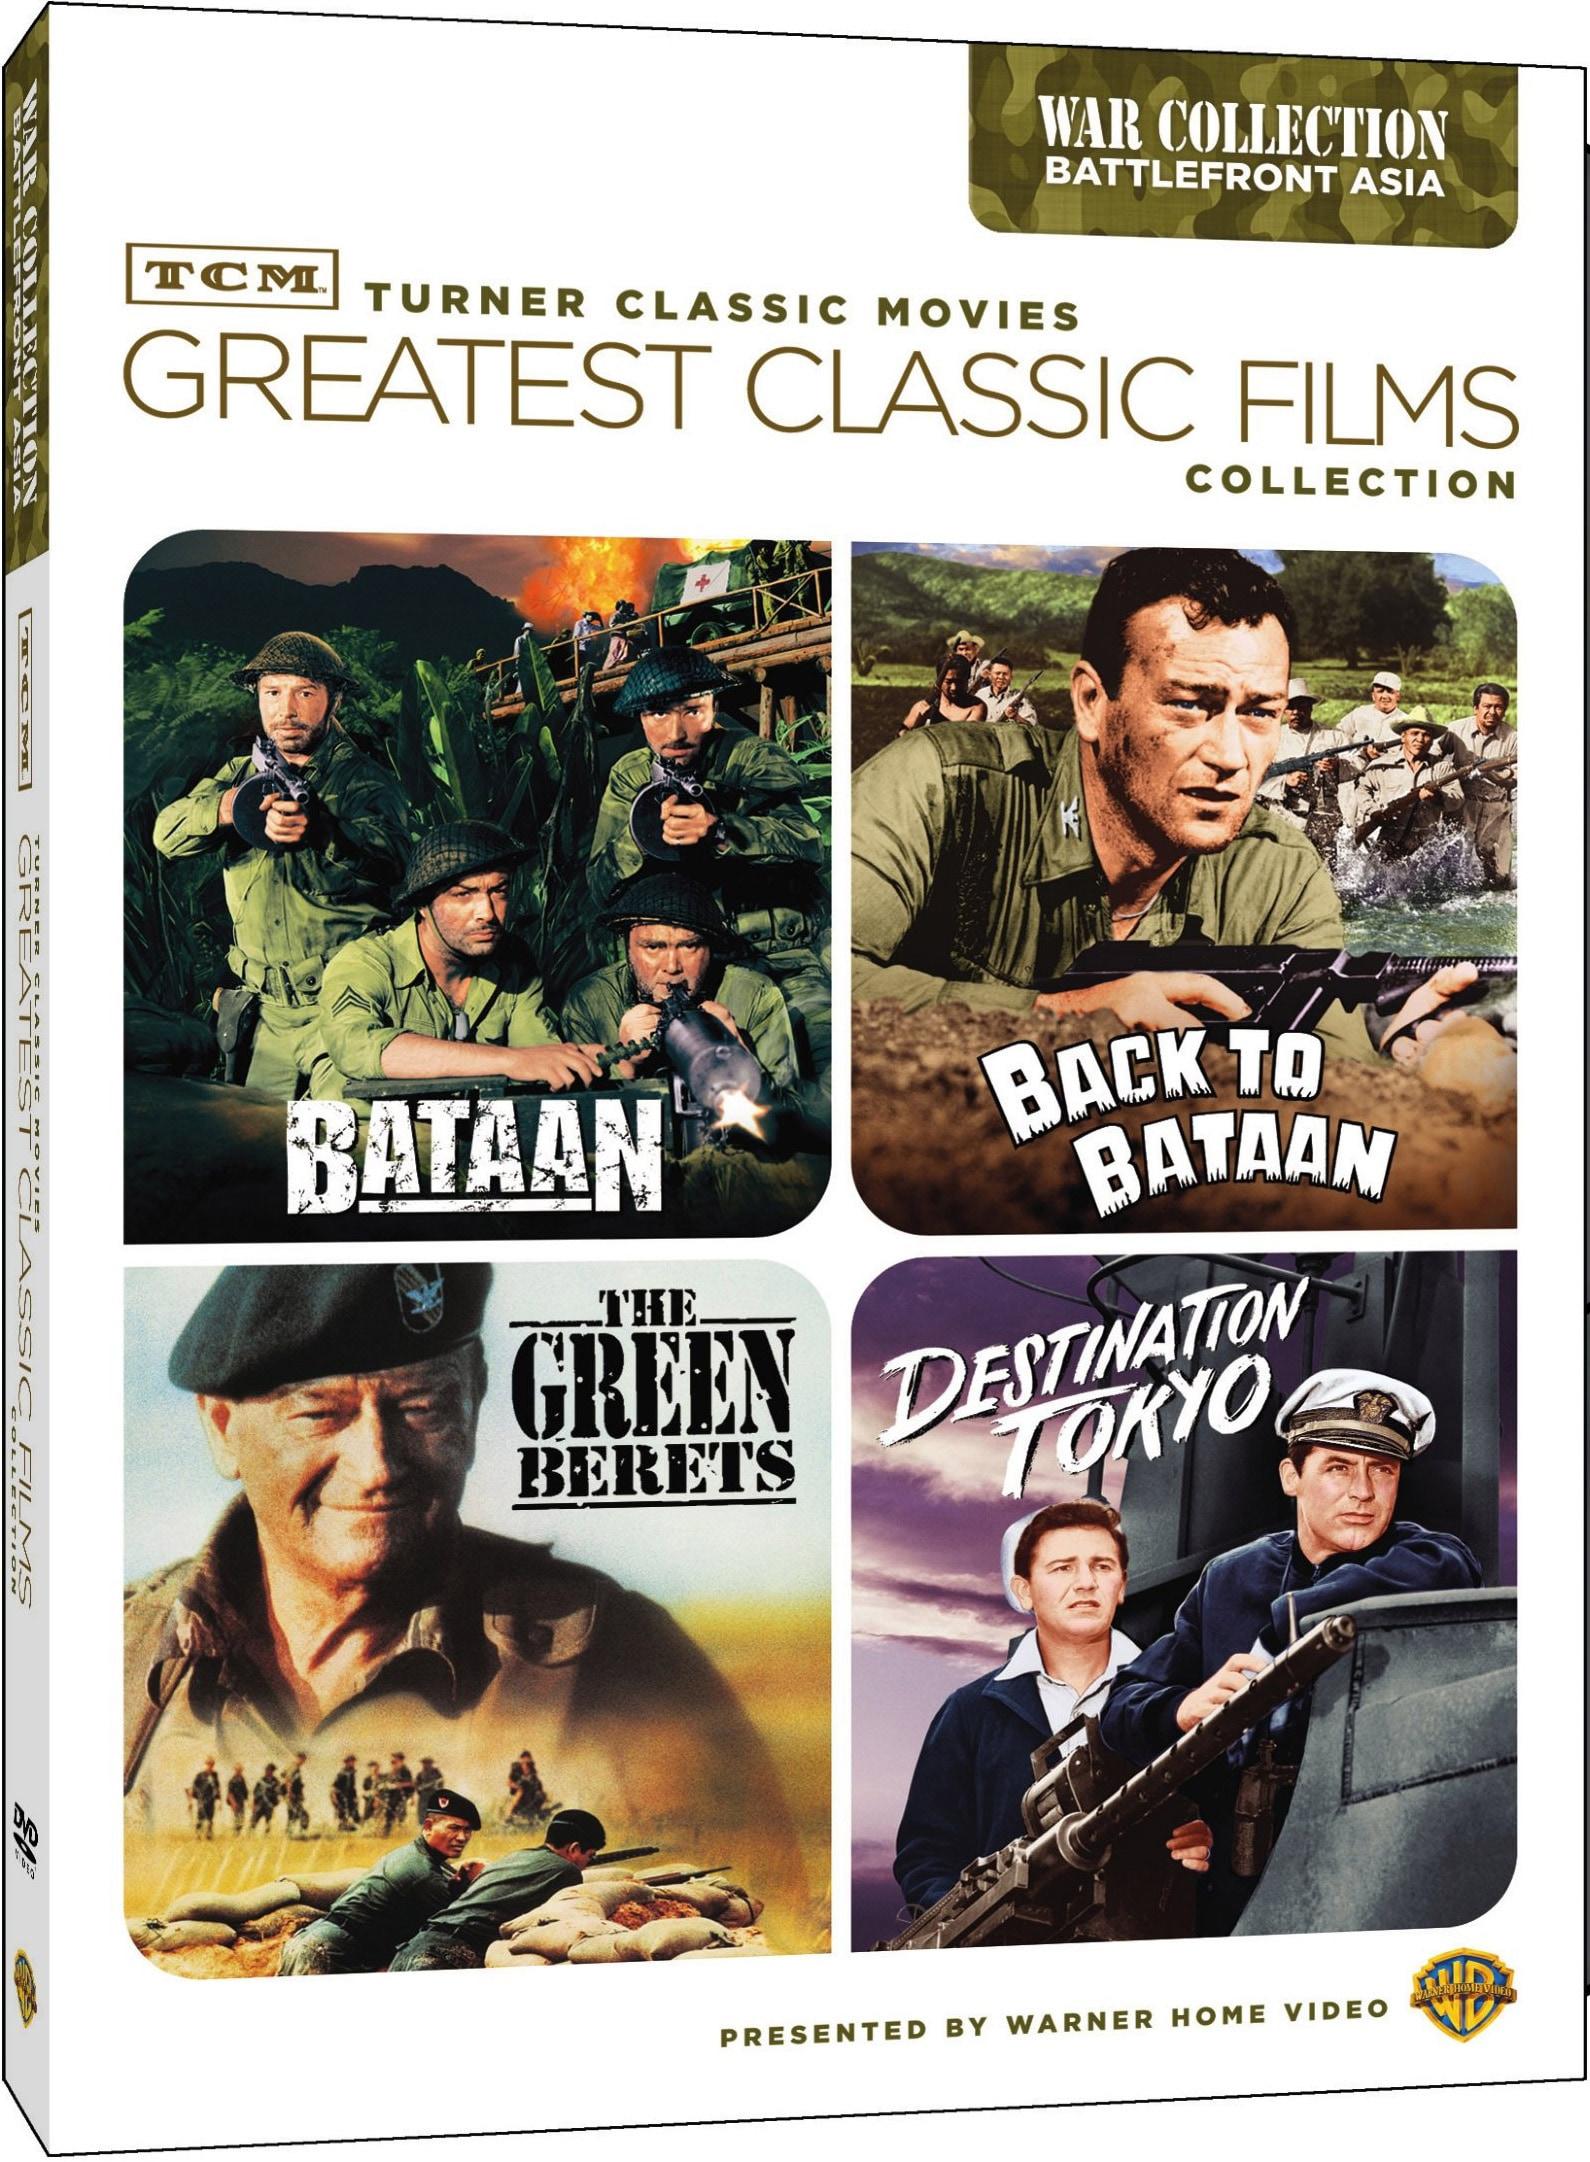 TCM Greatest Classic Films: World War II - Battlefront Asia (DVD)